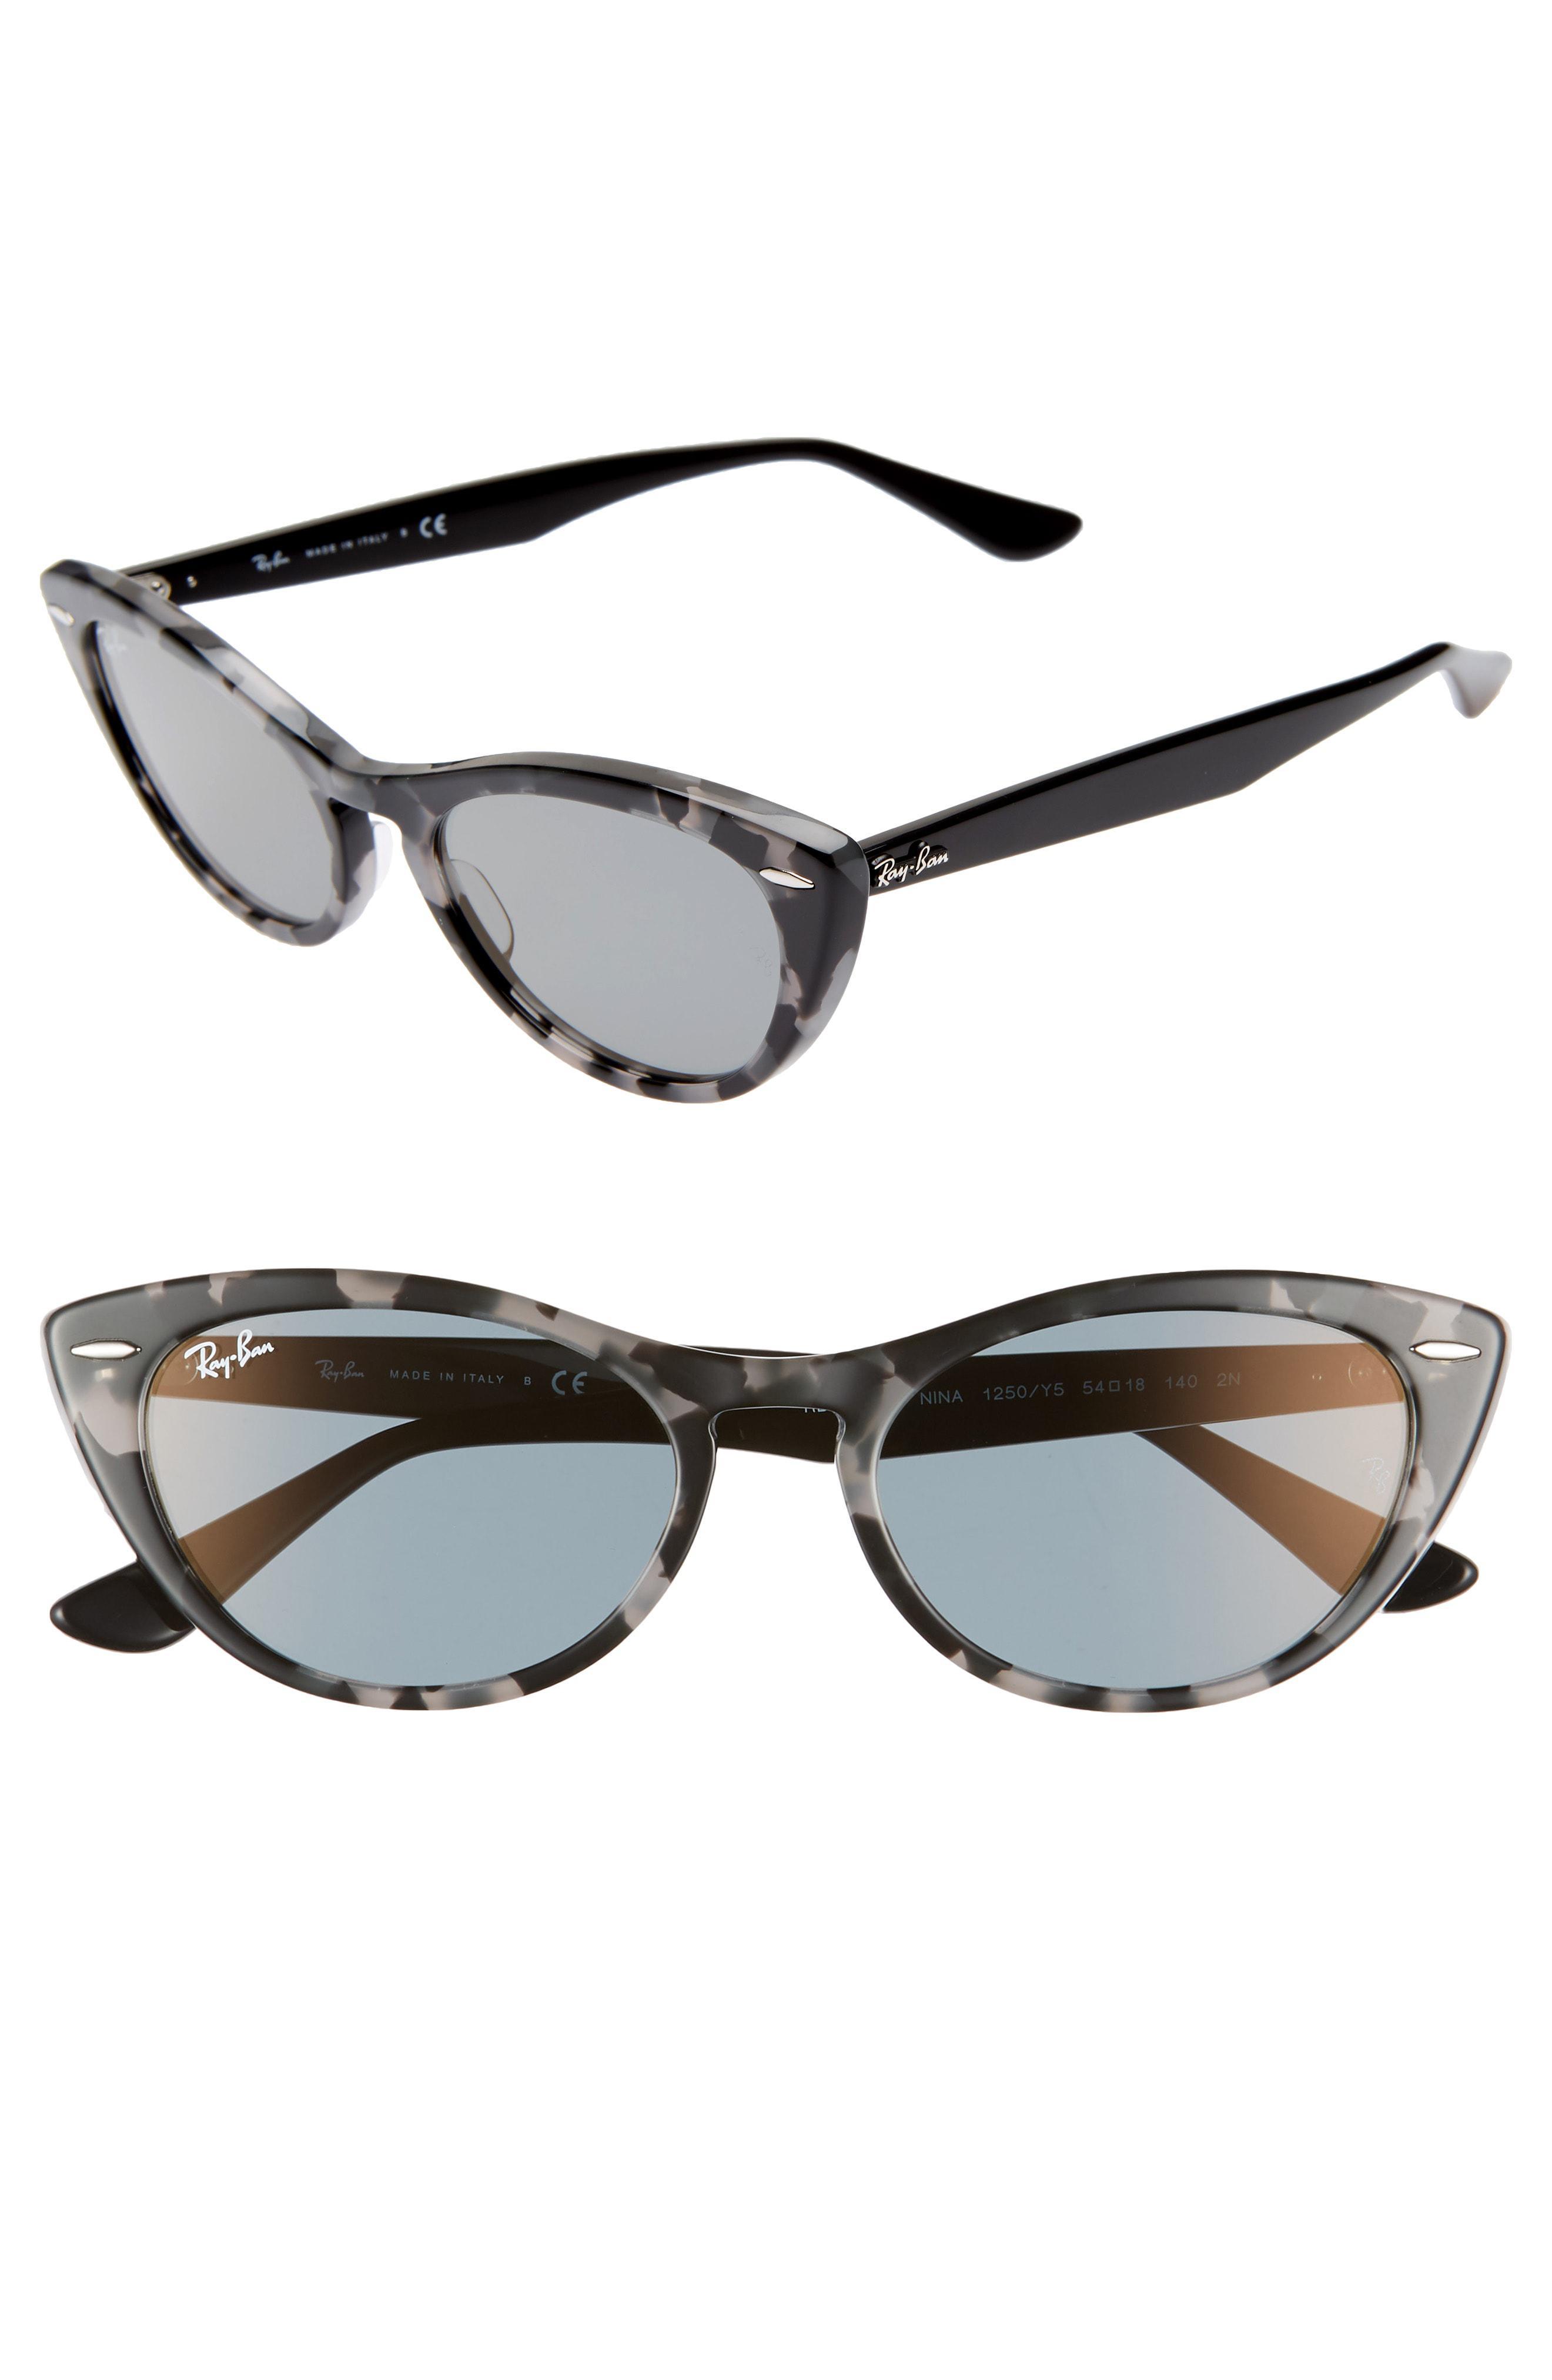 ee829d8207 Lyst - Ray-Ban Nina 54mm Cat Eye Sunglasses in Gray